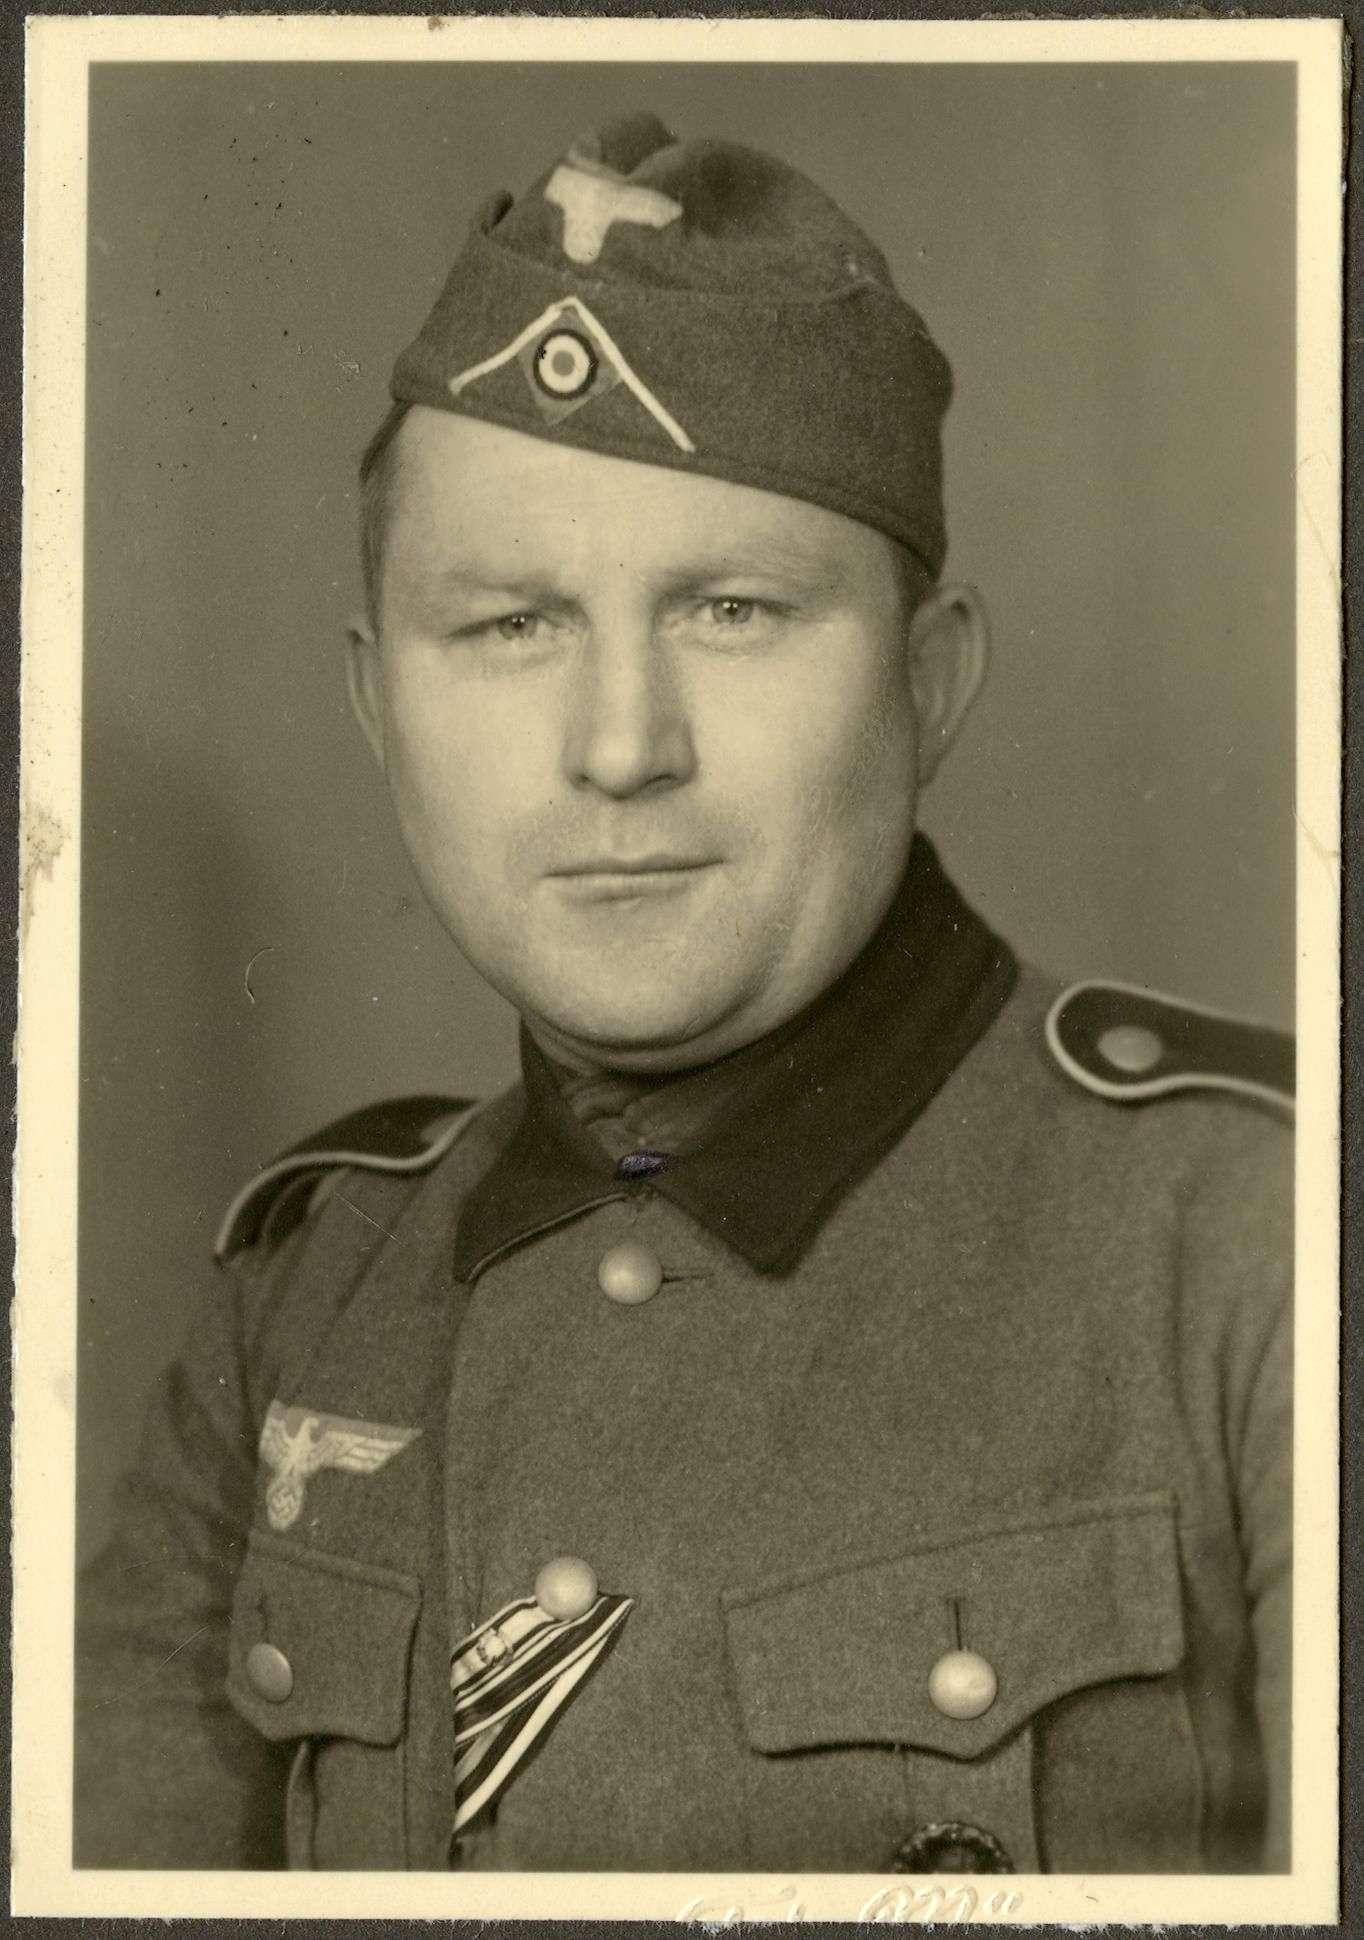 Wezel, Robert, Bild 1